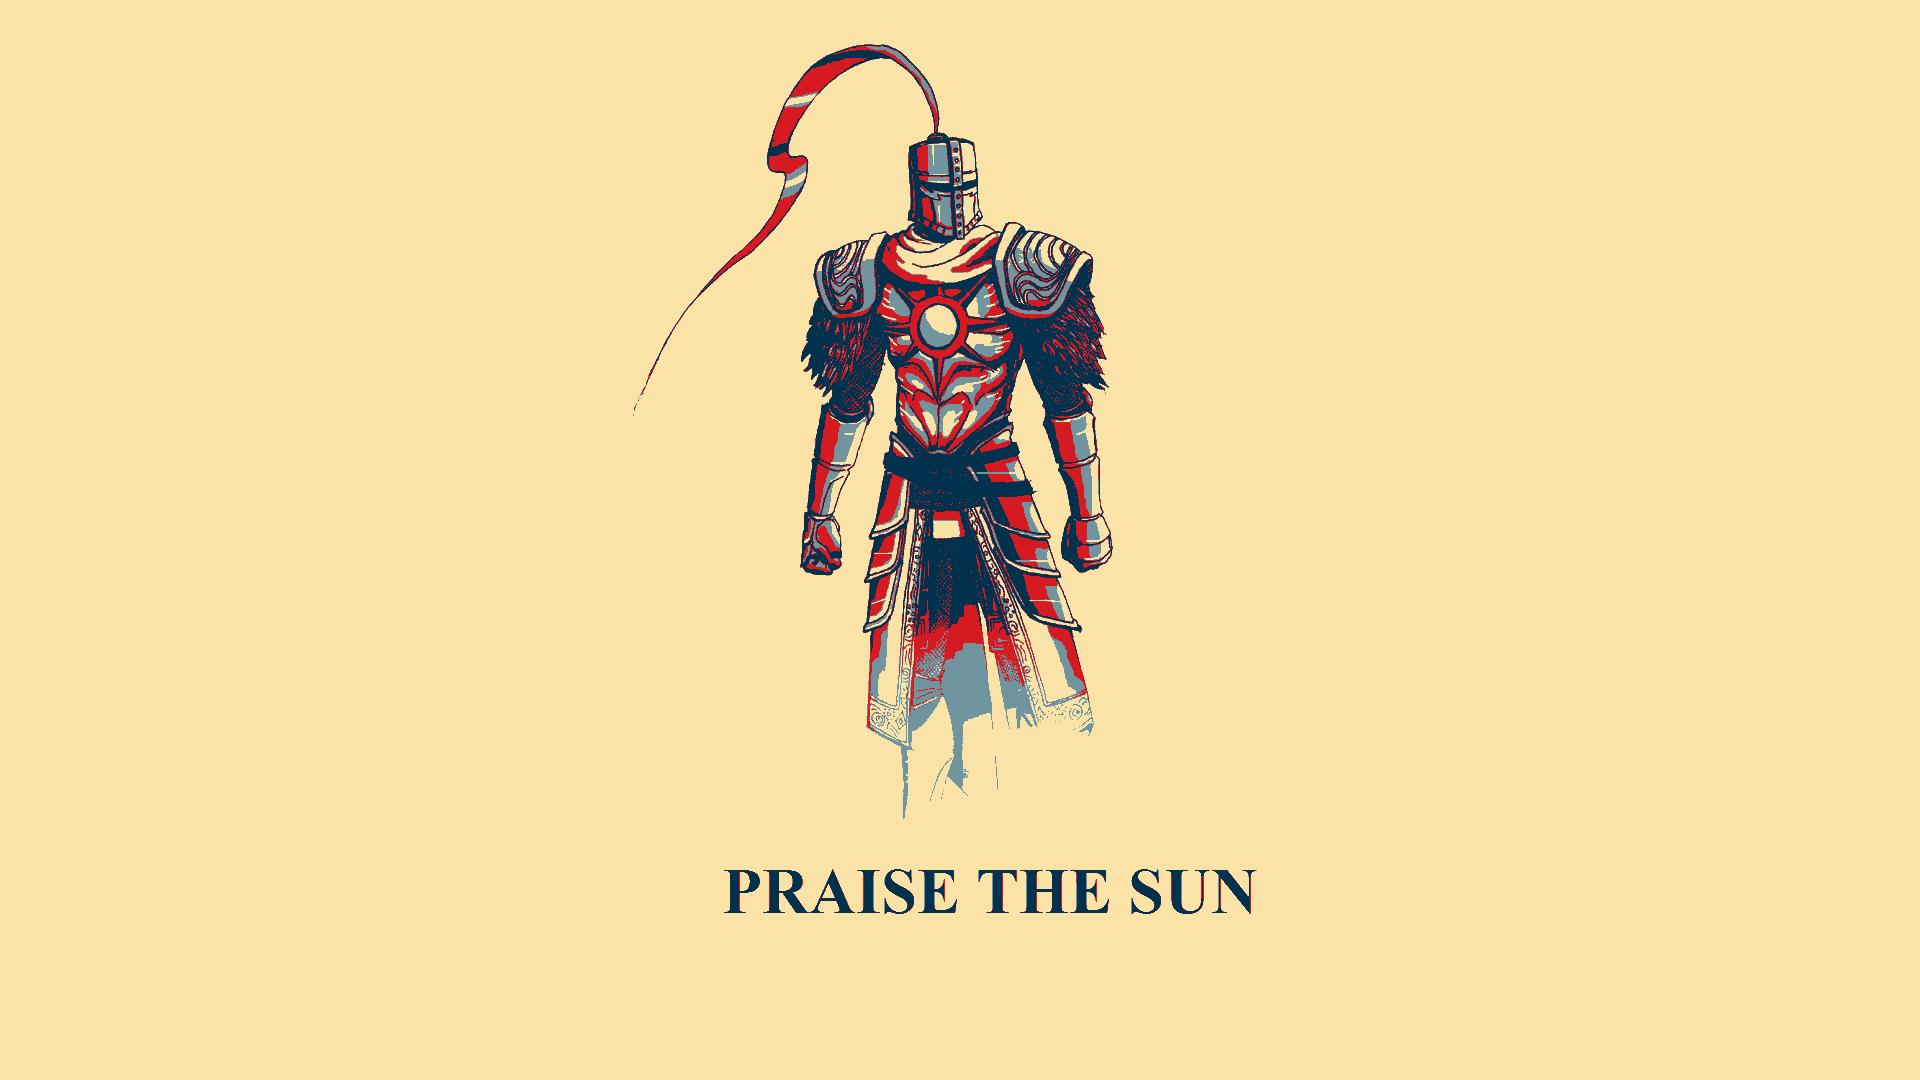 Praise The Sun Dark Souls Wallpaper Download Free Hd Wallpapers